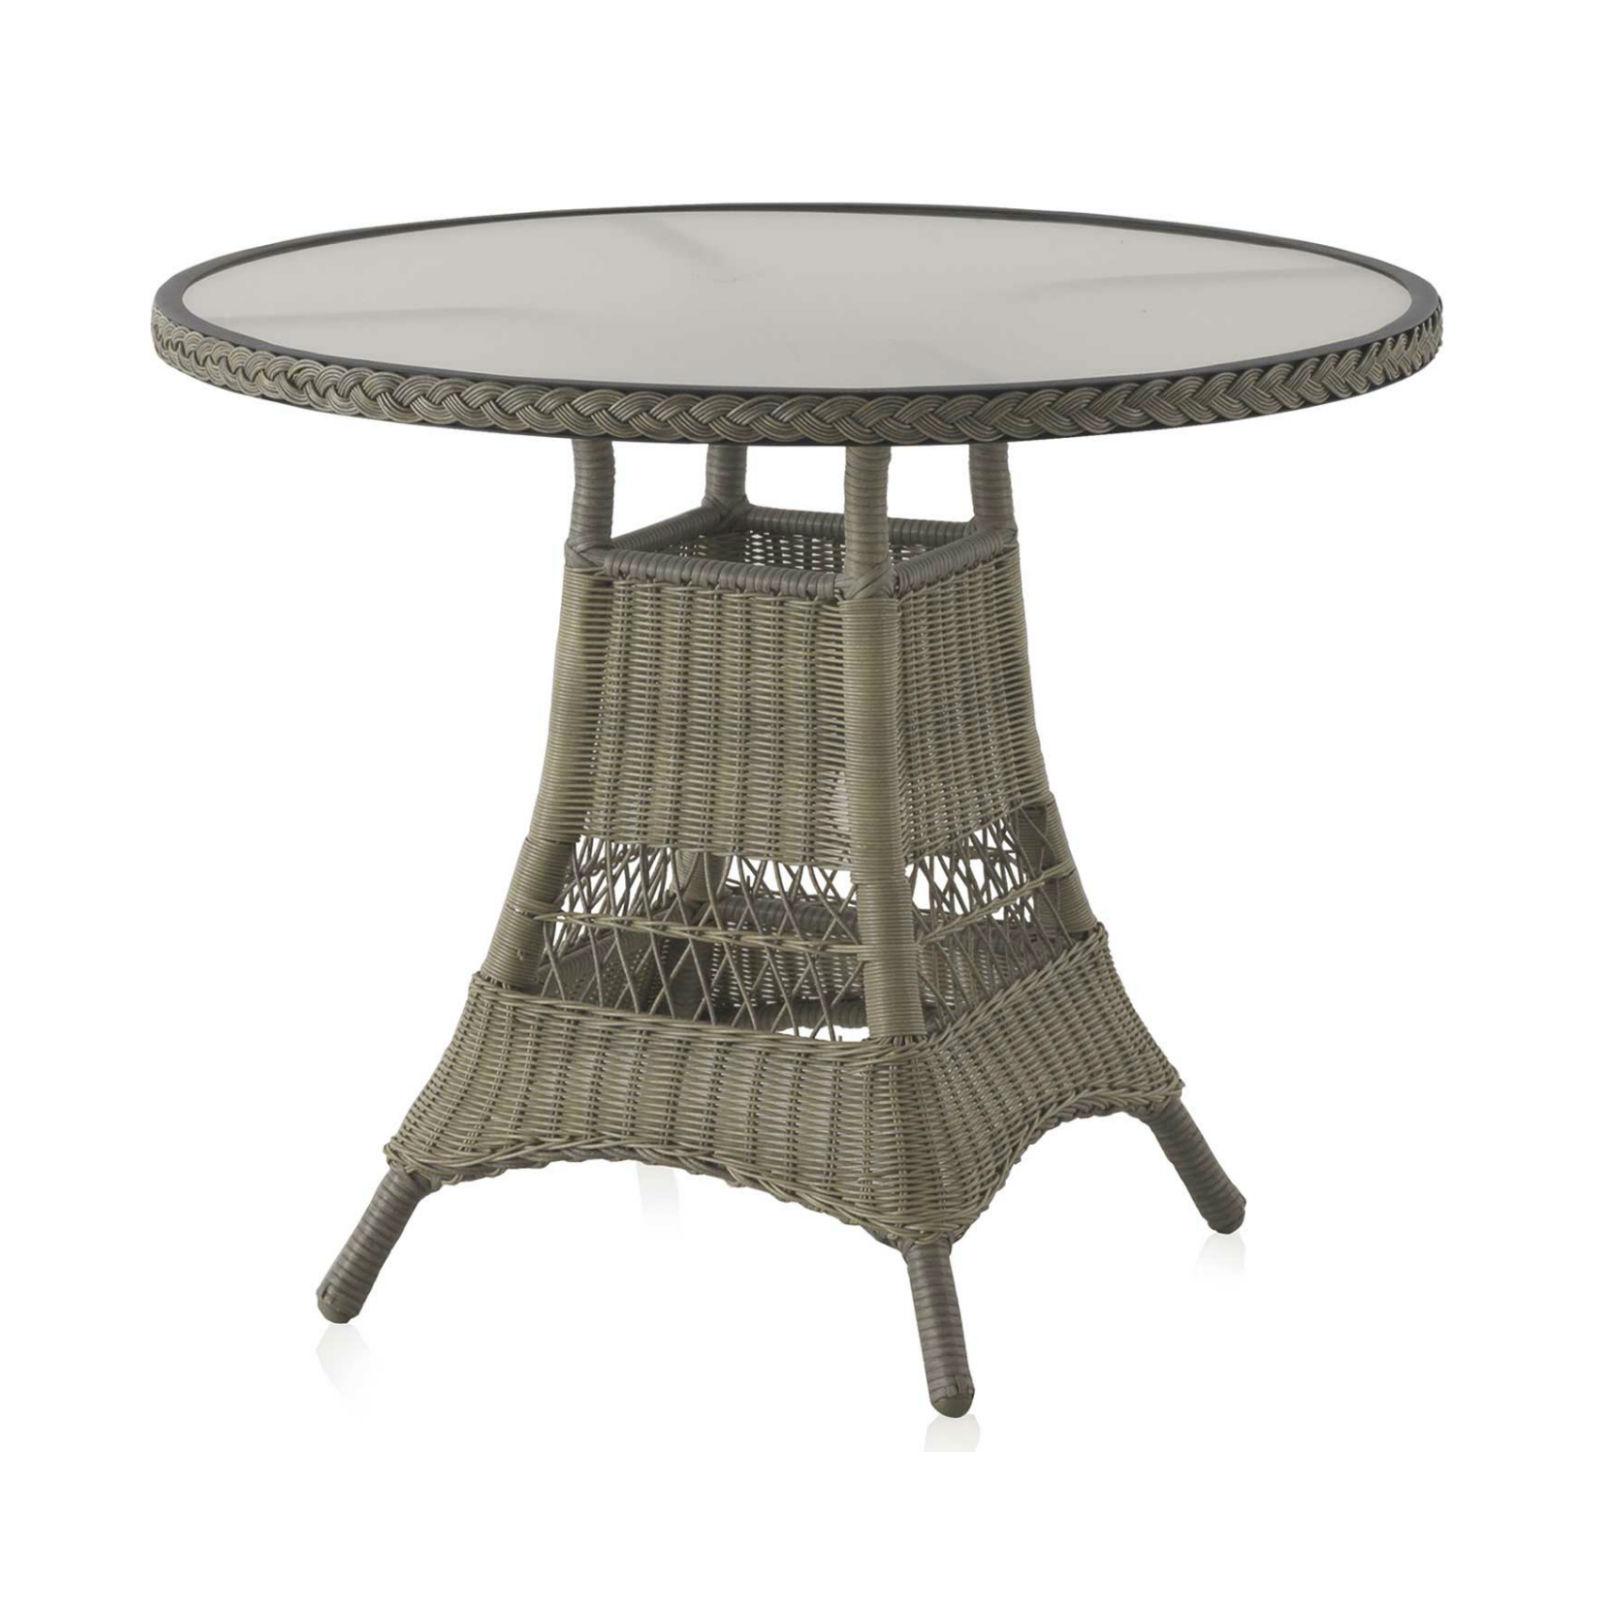 Table Ronde De Jardin 90 Cm Aluminium Et Résine Tressée - Brin D'ouest serapportantà Petite Table Ronde De Jardin